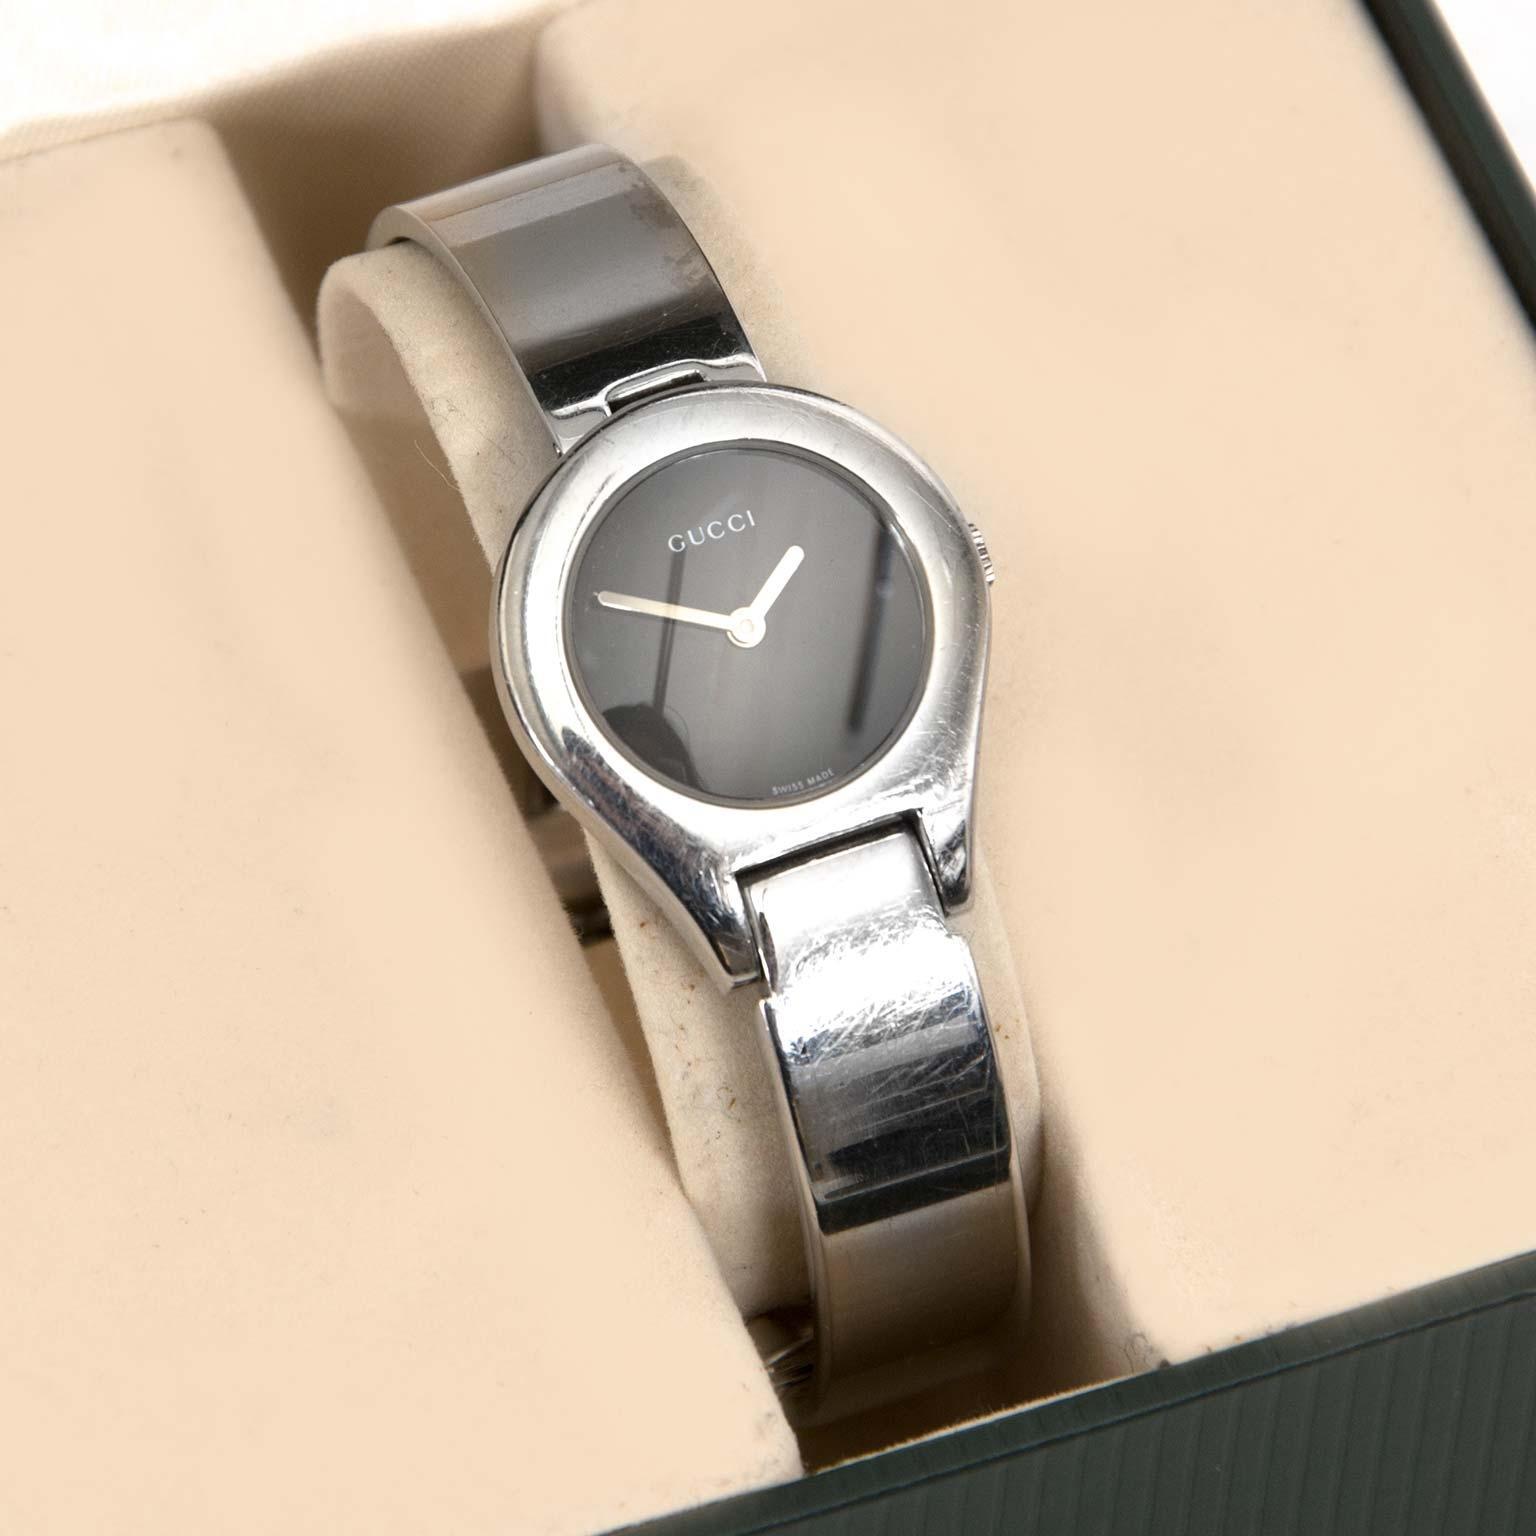 f5a9308dd6b5 ... sale at labellov antwerp for the best price Gucci Silver 6700 L Series  Watch en vendre chez labellov anvers au meilleur prix